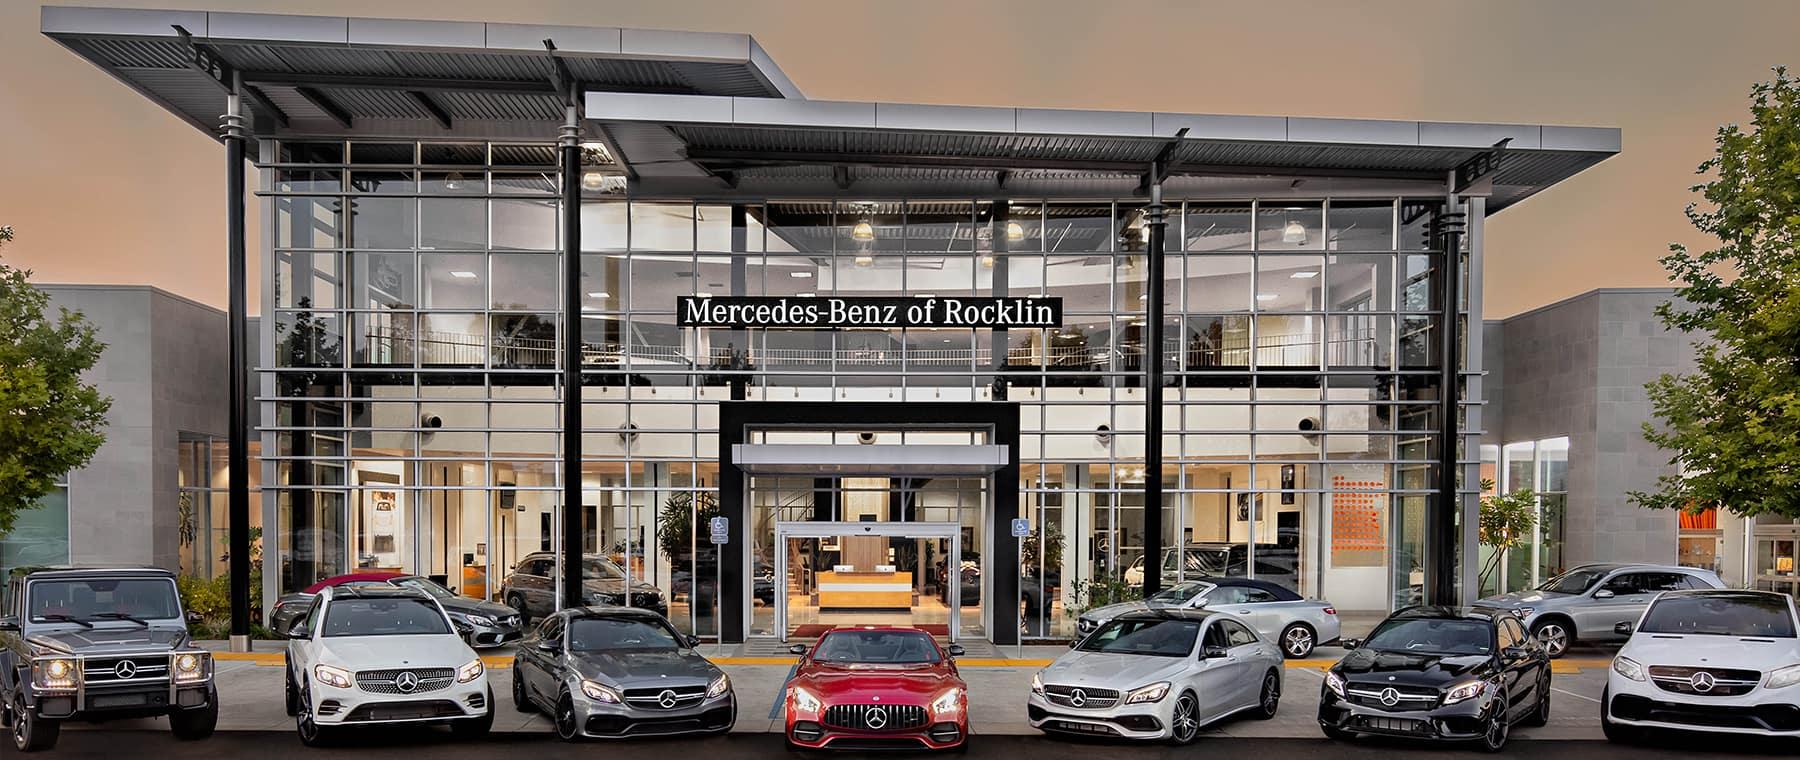 brampton cars used dealer fallback benz video new mercedes background on